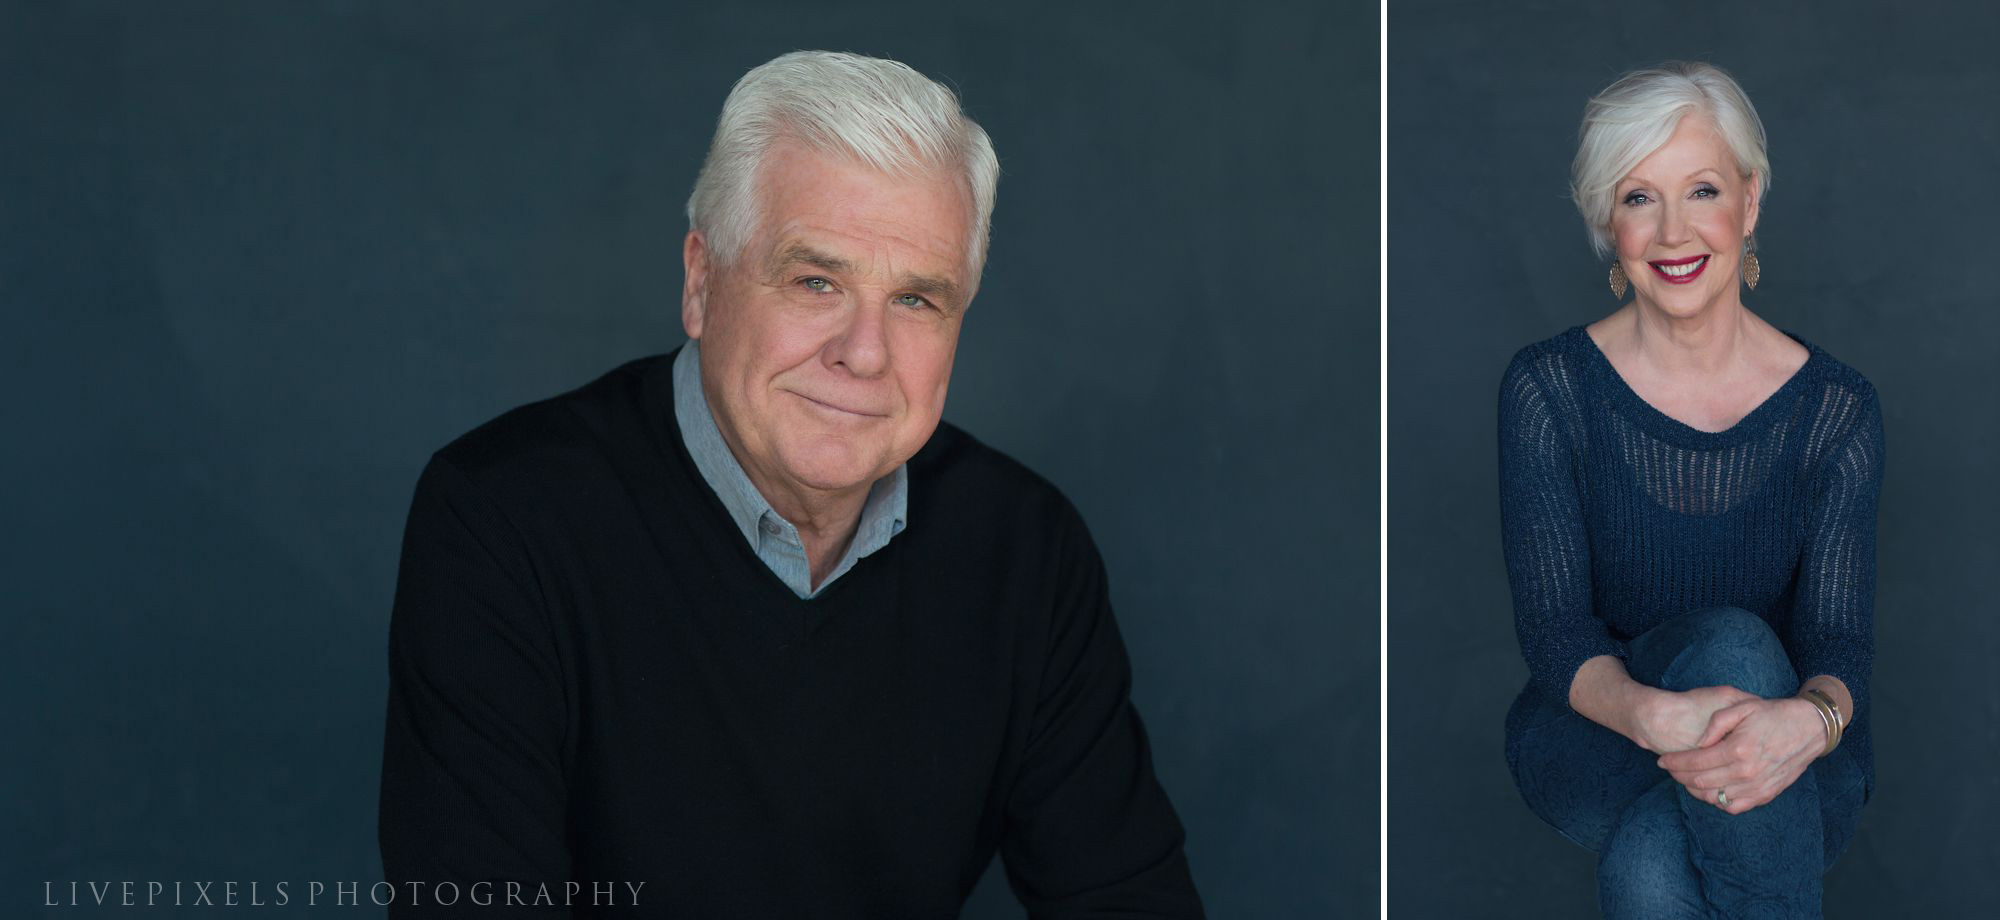 Family Portraits, 30th anniversary studio portrait - Livepixels Photography, Toronto / livepixelsphotography.com